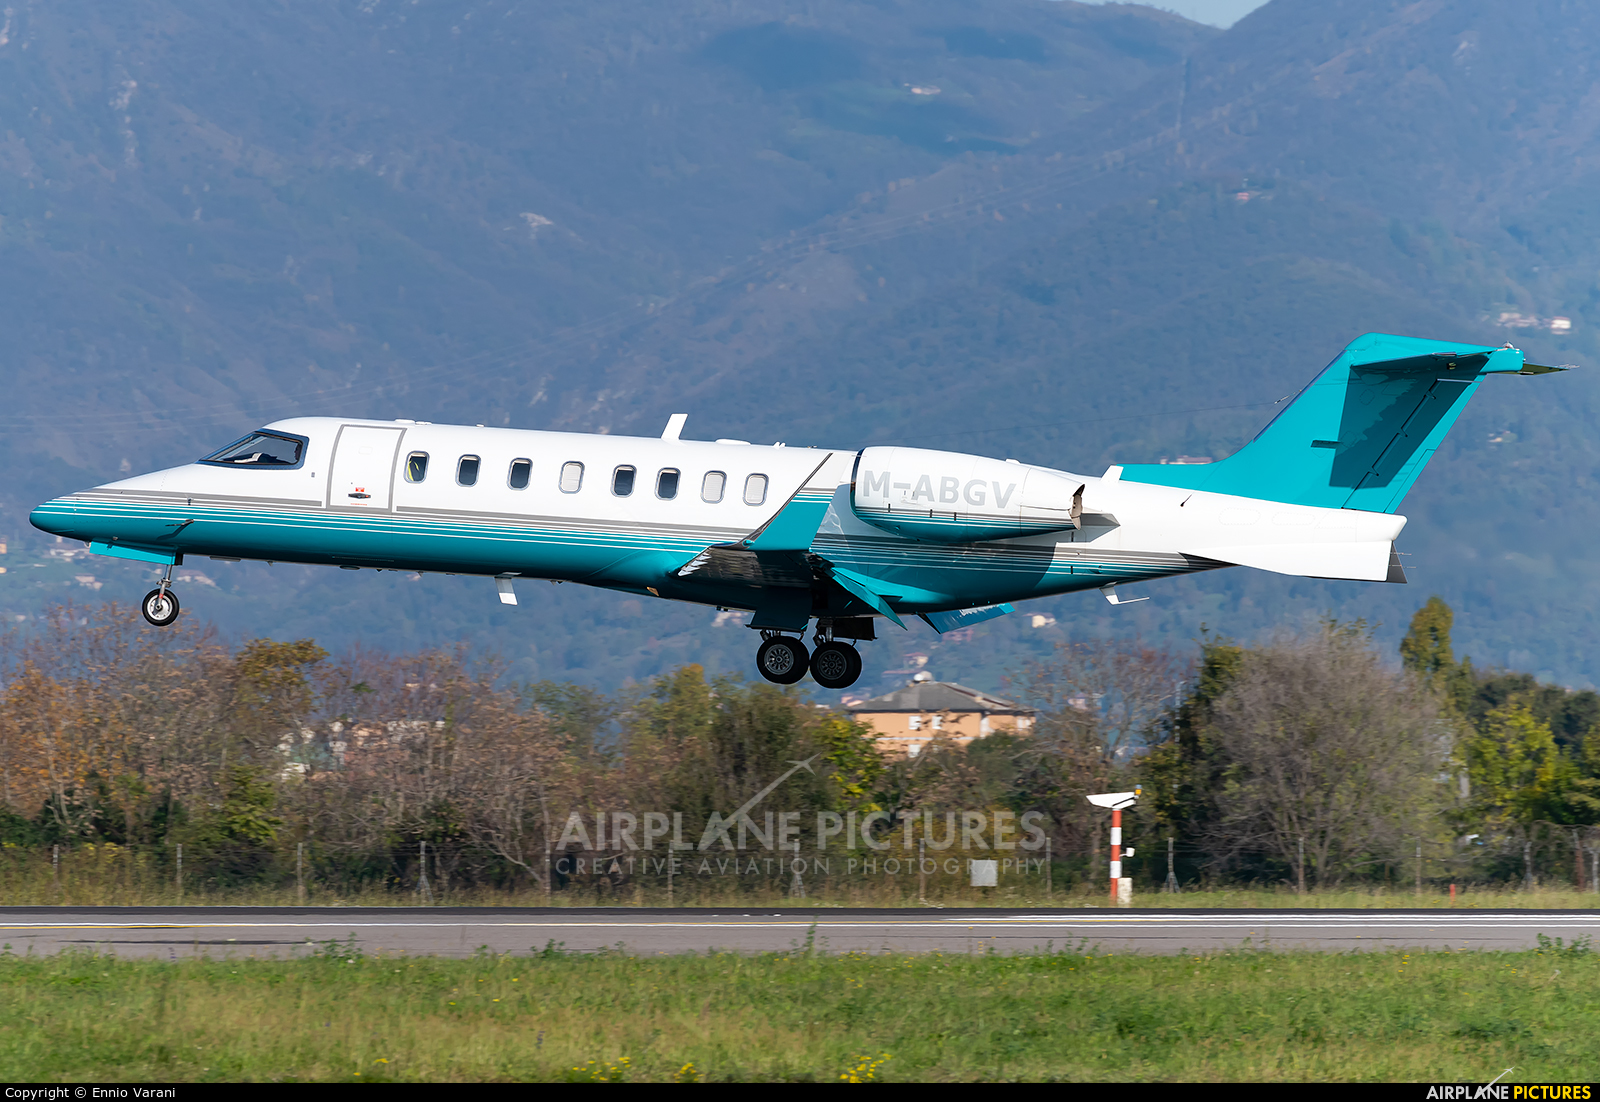 Ryanair M-ABGV aircraft at Bergamo - Orio al Serio